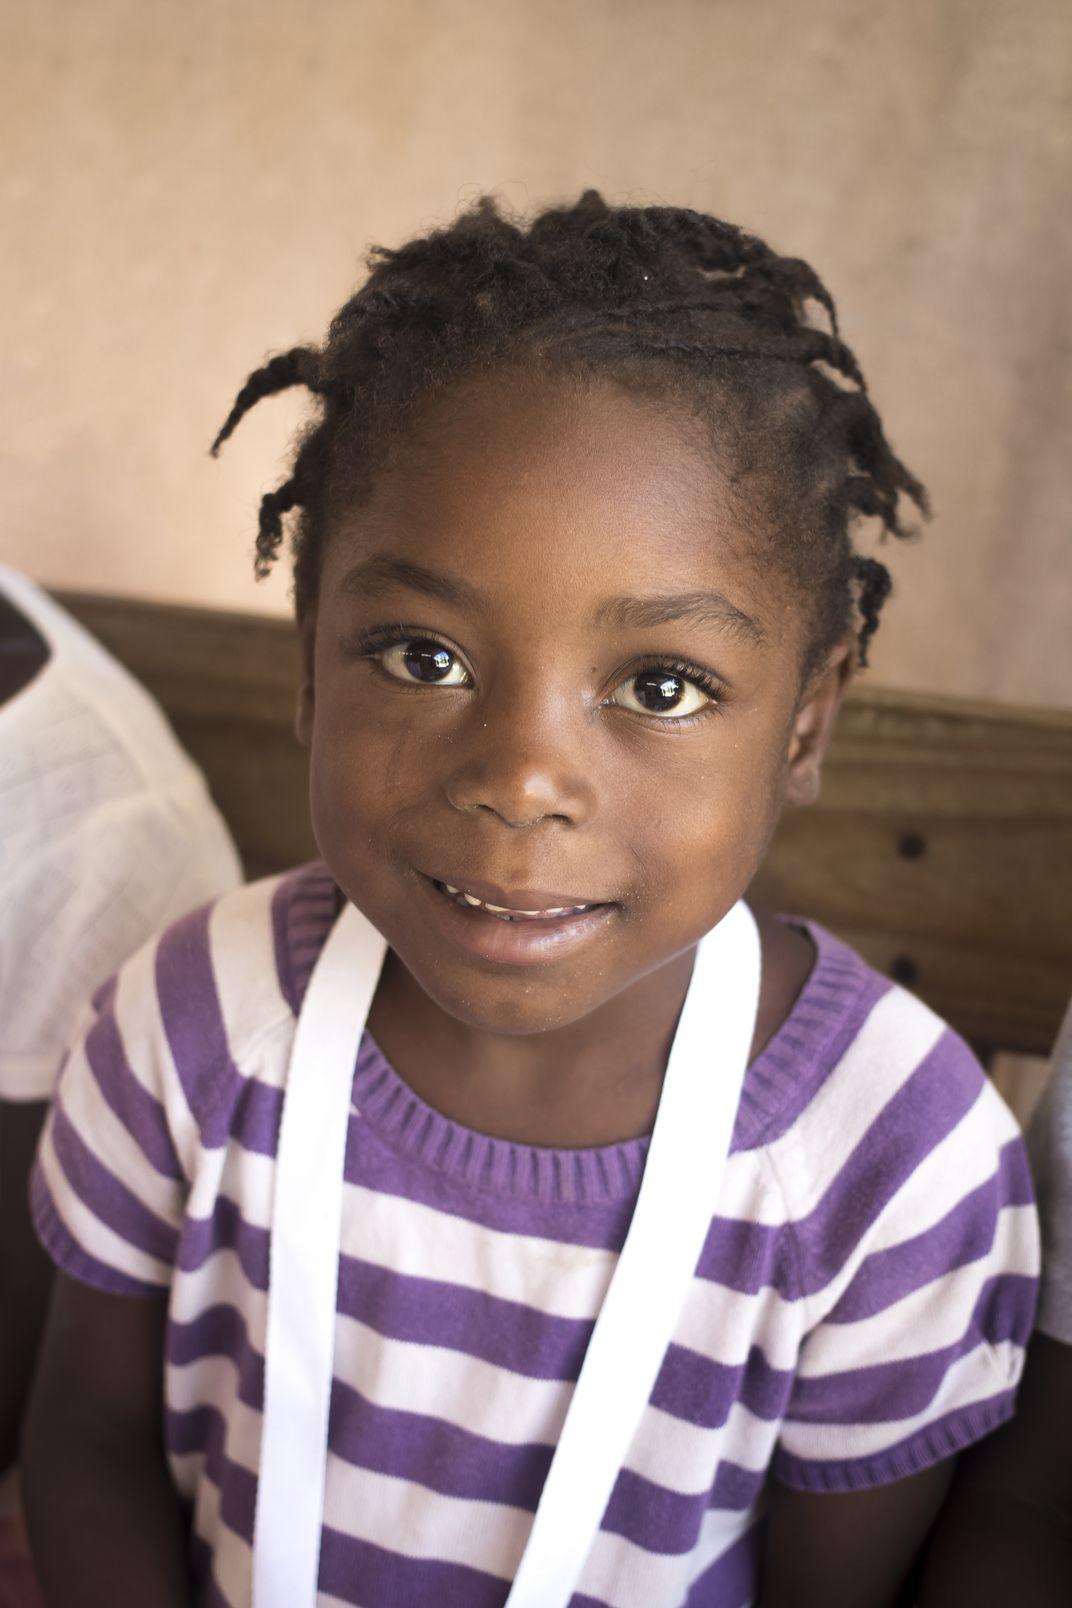 Young Haitian Girl | Smithsonian Photo Contest